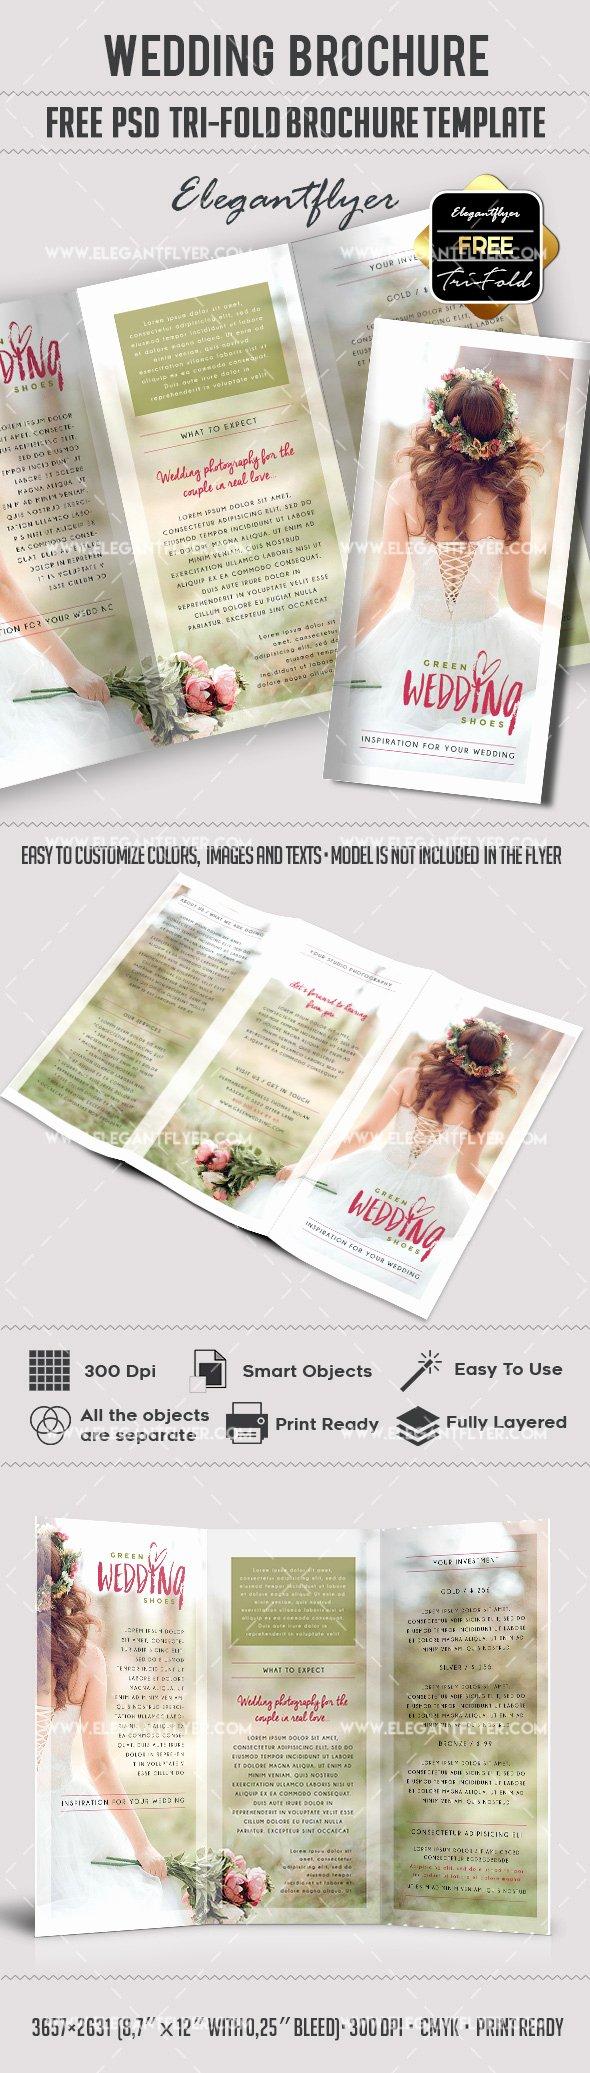 Wedding – Free Tri Fold Psd Brochure Template – by